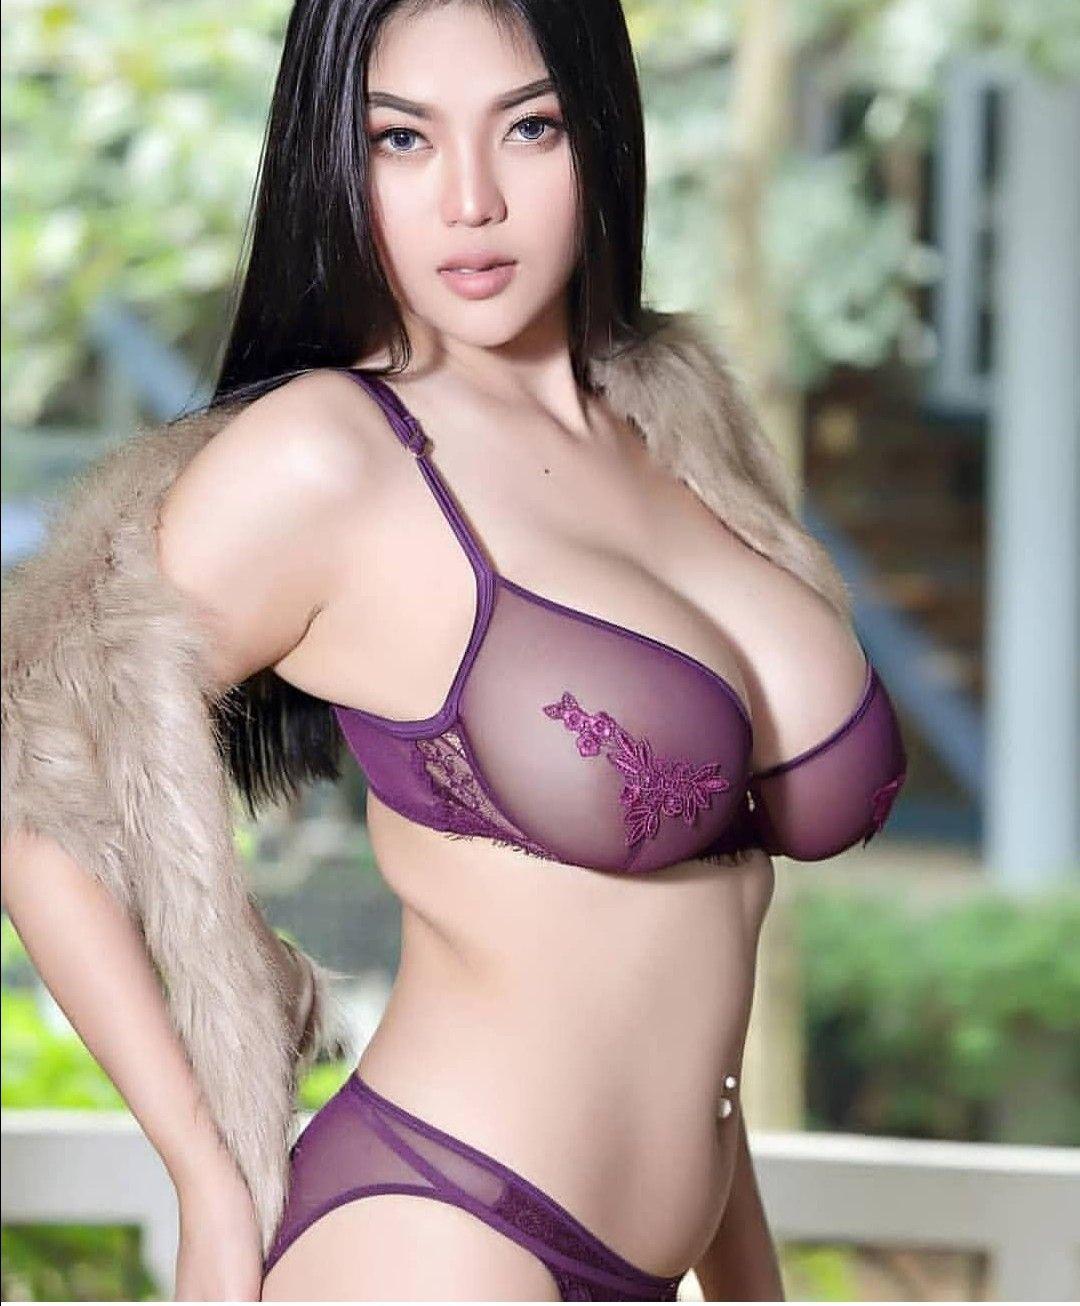 Sexy asian woman wearing black bra stock photo